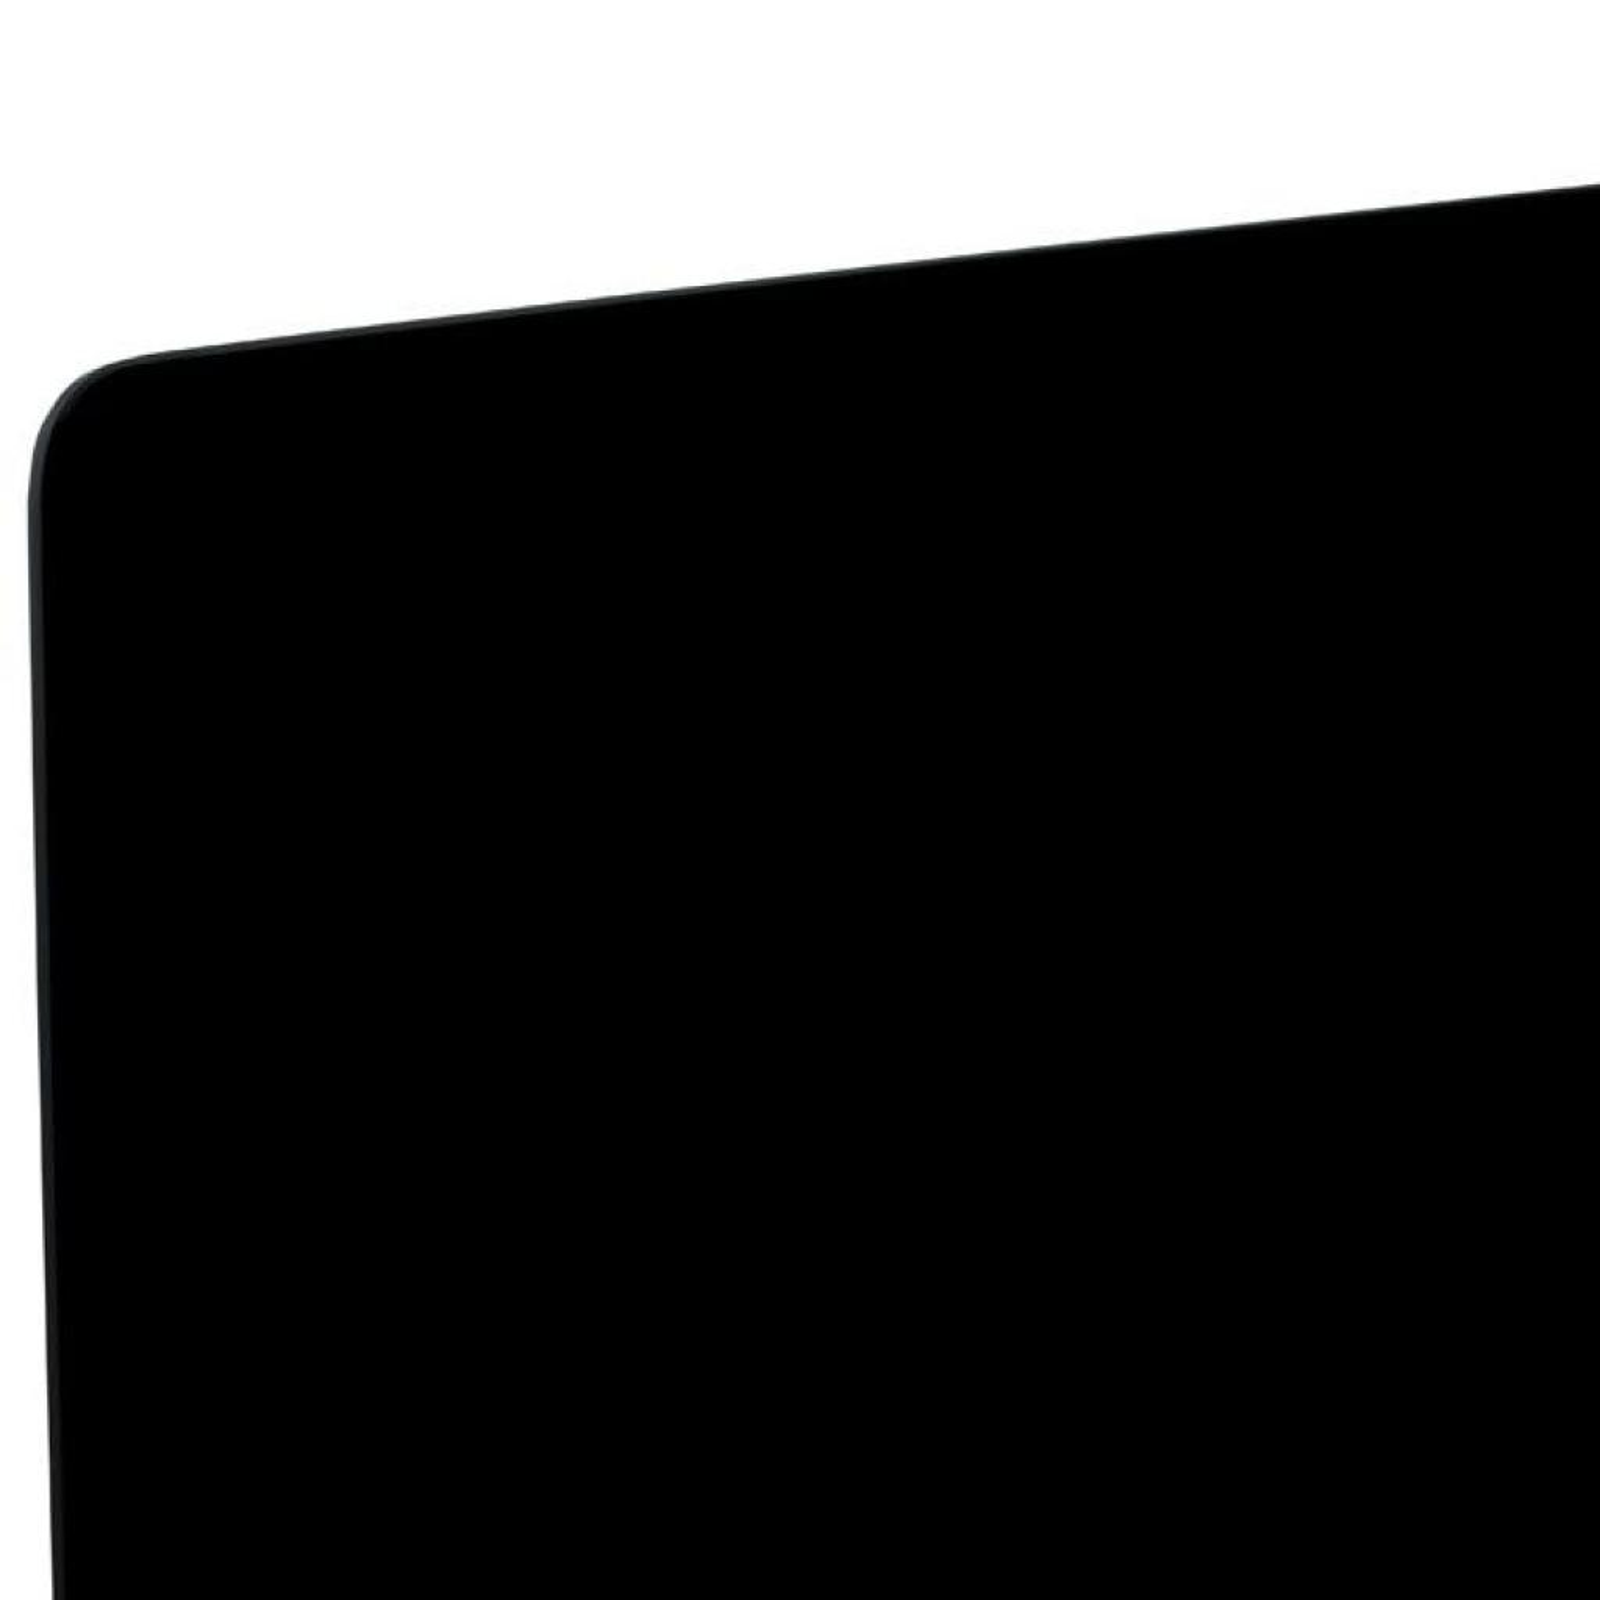 Обогреватель SunWay SWG-RA450 BLACK (SWG-RA450-BLACK) изображение 2